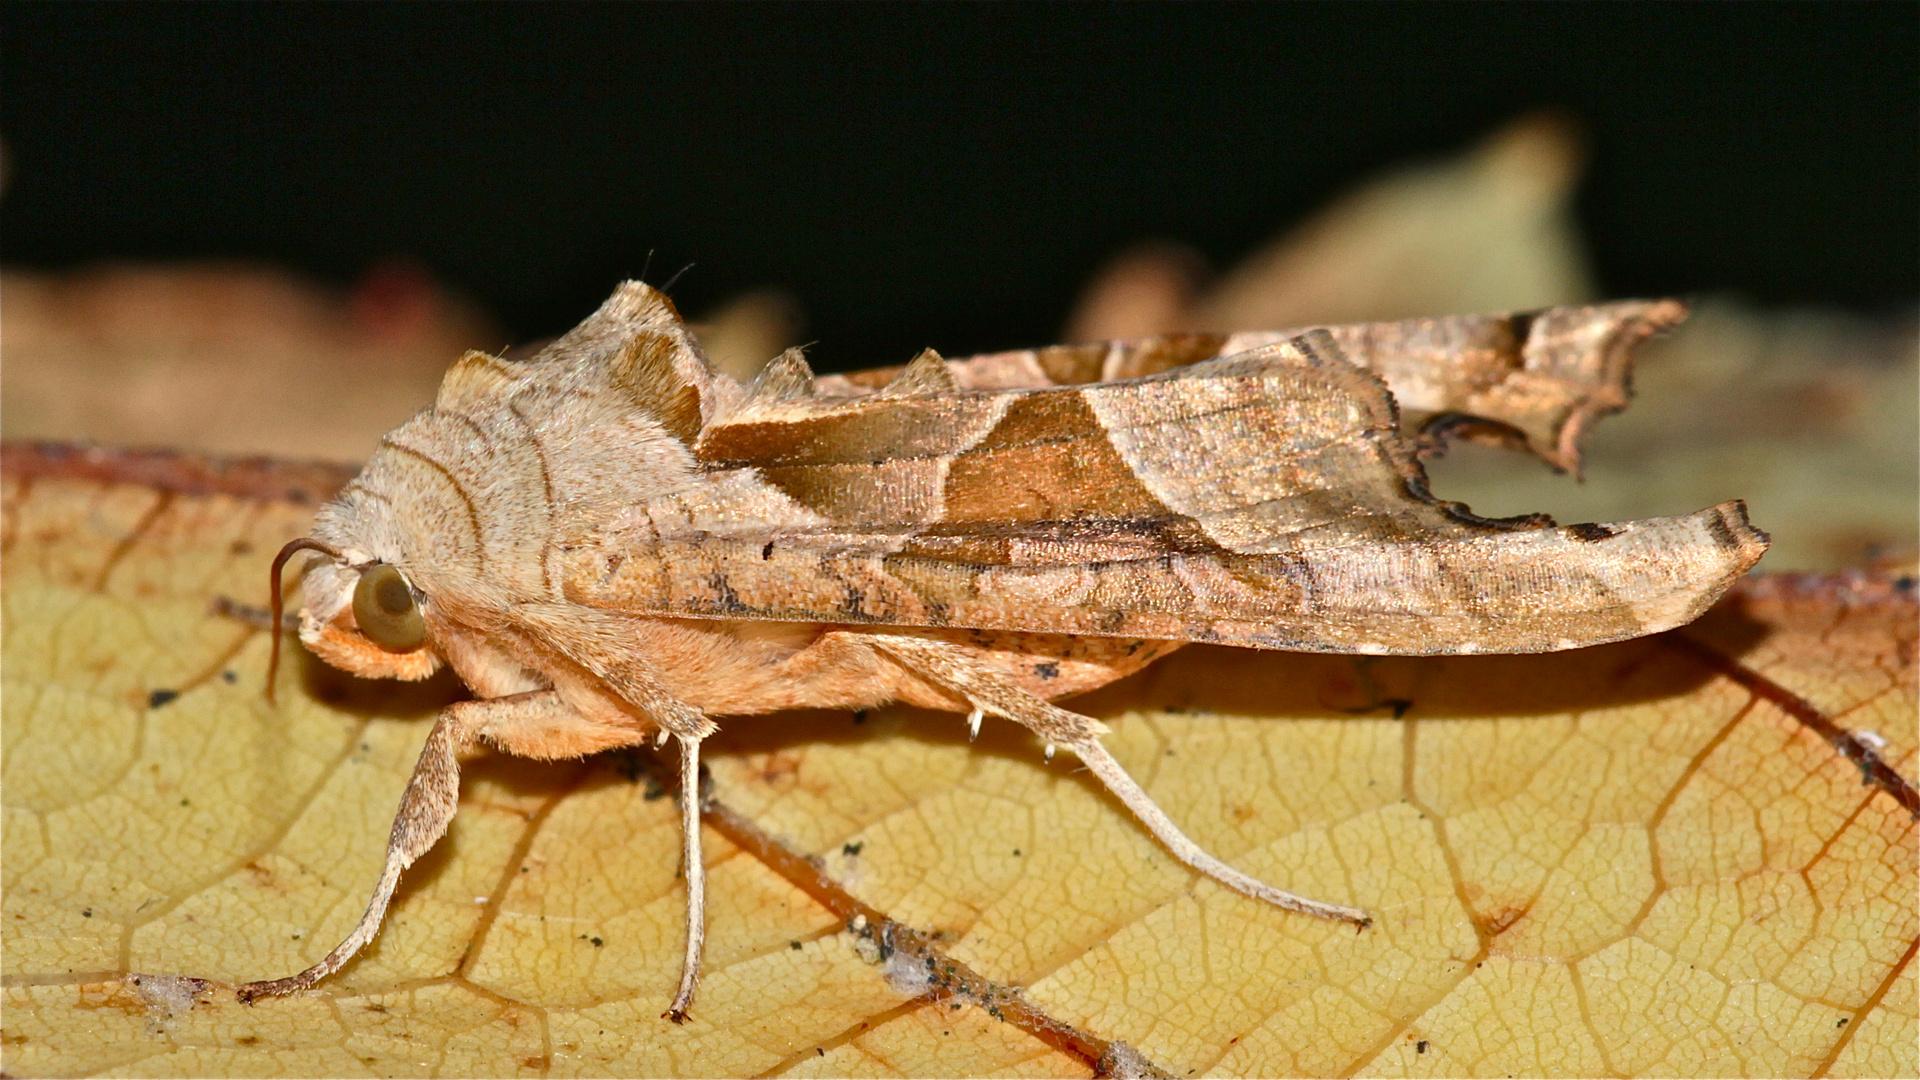 Die Achateule (Trigonophora meticulosa)  (Bild 4) . . .